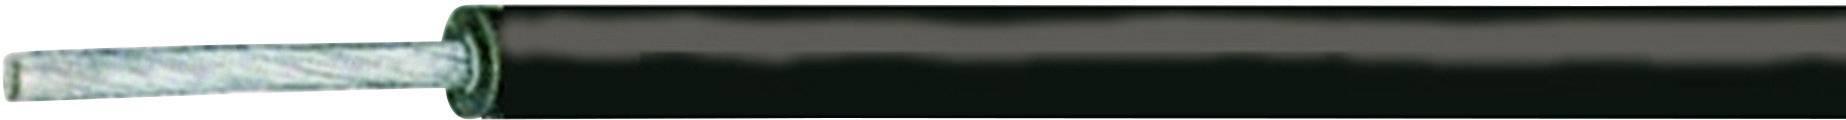 Stikalna žica SiL-SiAF 1 x 1.50 mm, zelena, rumena XBK Kabel cena za meter